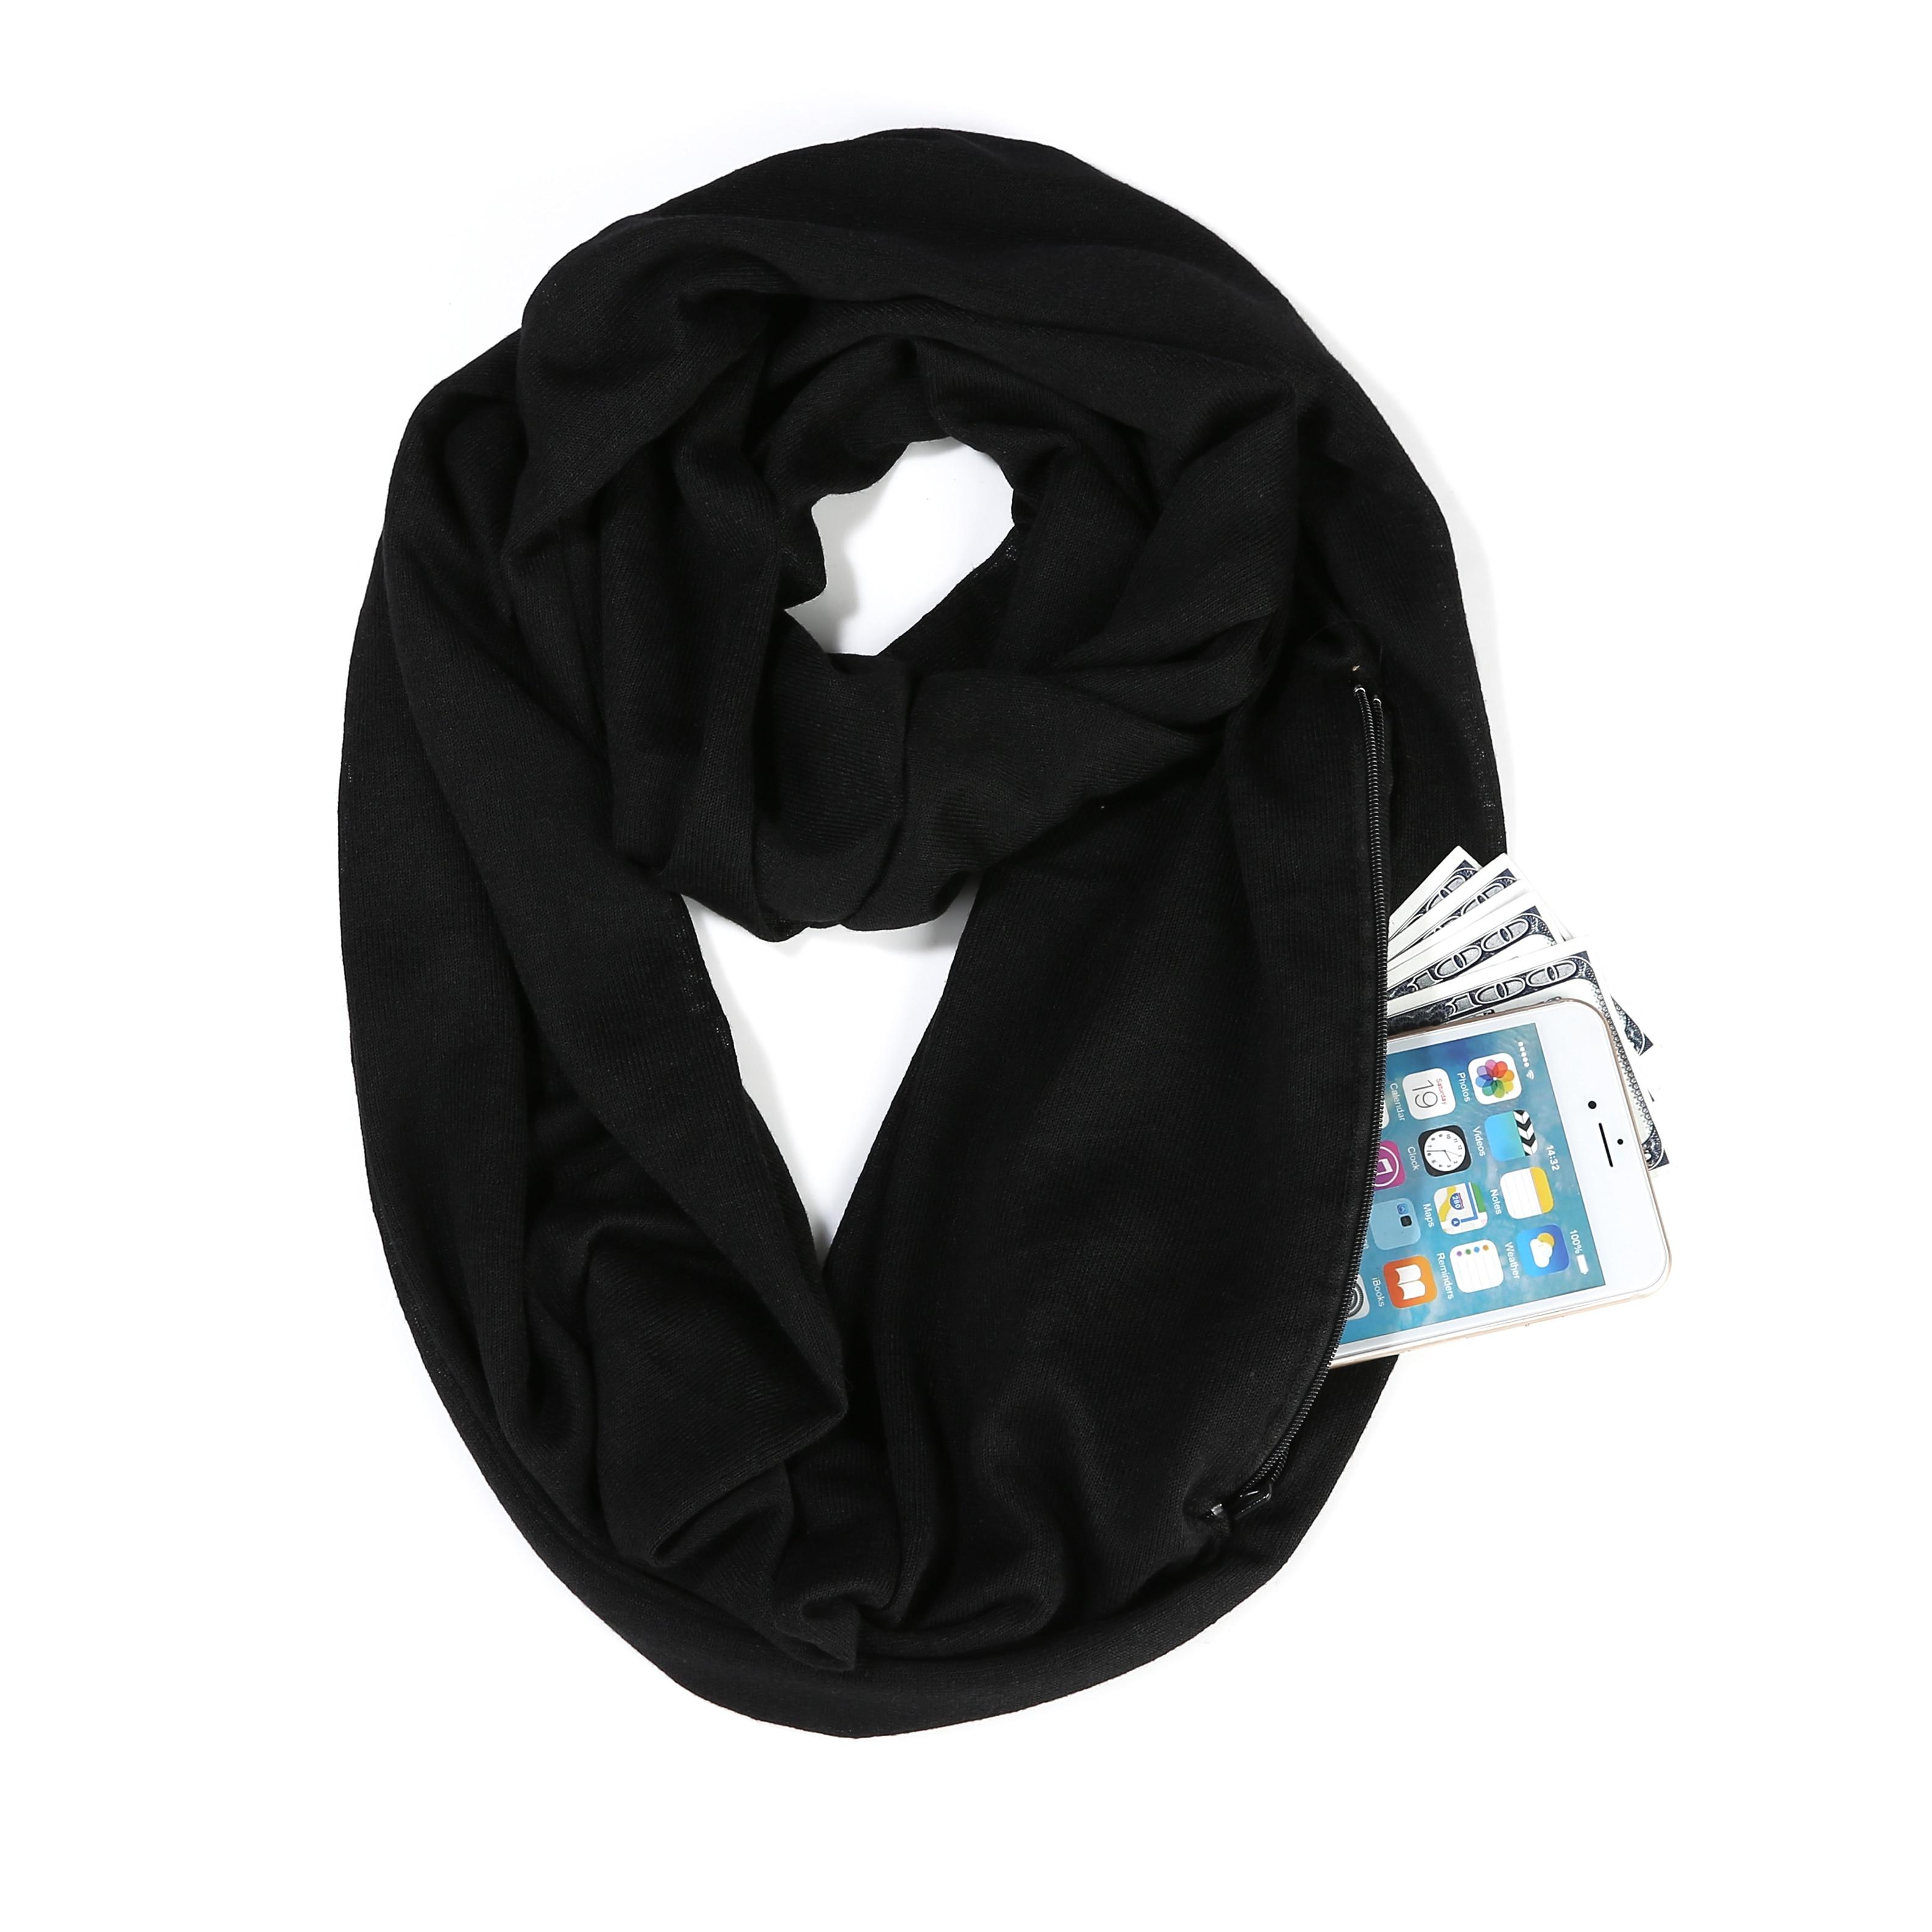 Girl Solid Black Winter Scarf With Pocket Knitted Warm Convertible Journey Women&Man Wrap With Secret Hidden Zipper Pocket Infin